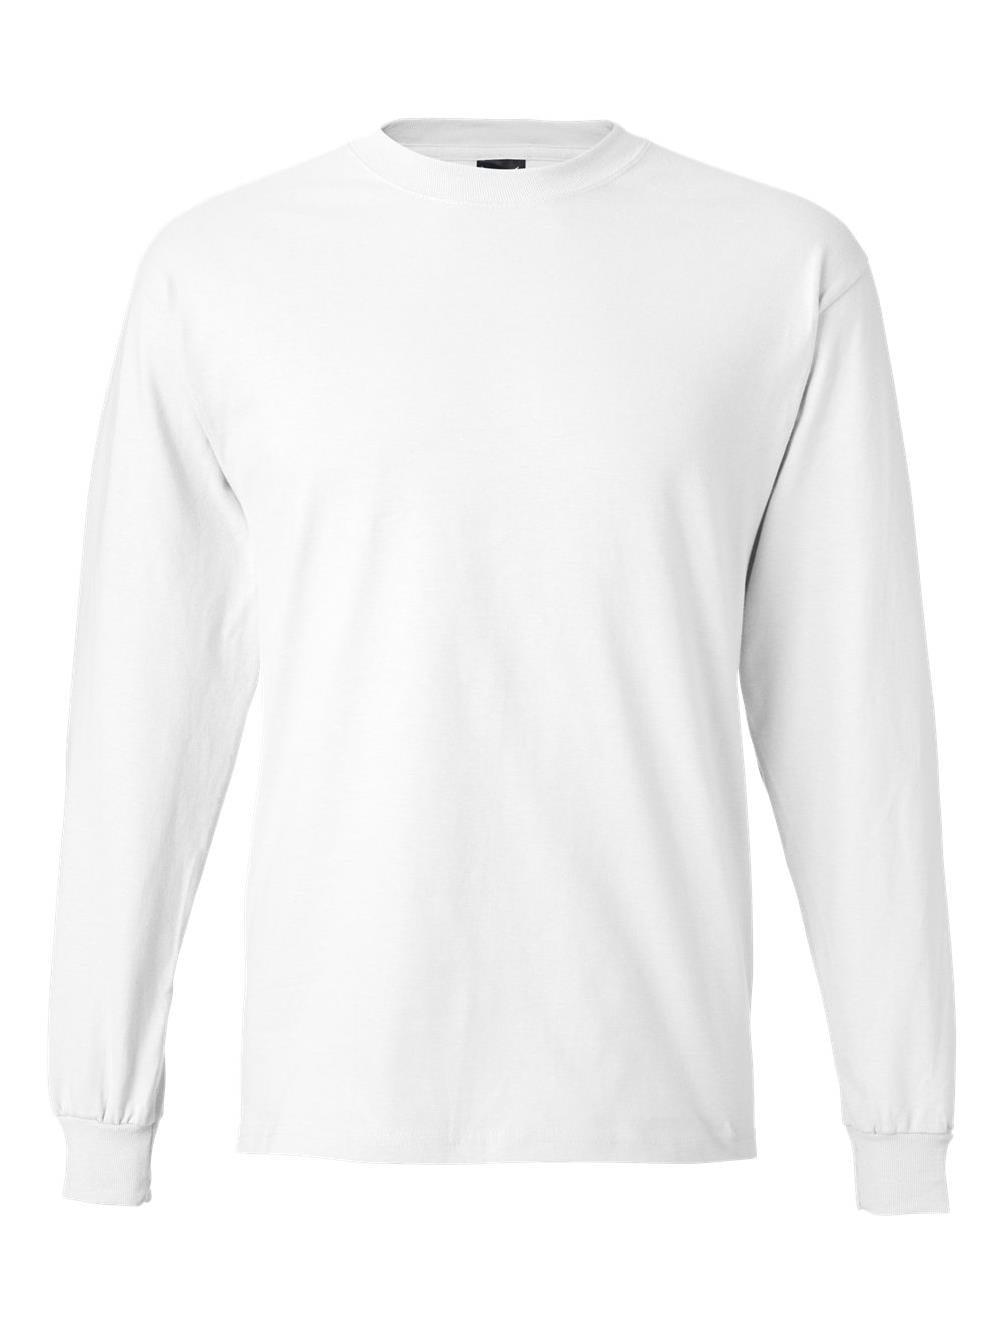 T-Shirts - Long Sleeve Beefy-T Long Sleeve T-Shirt